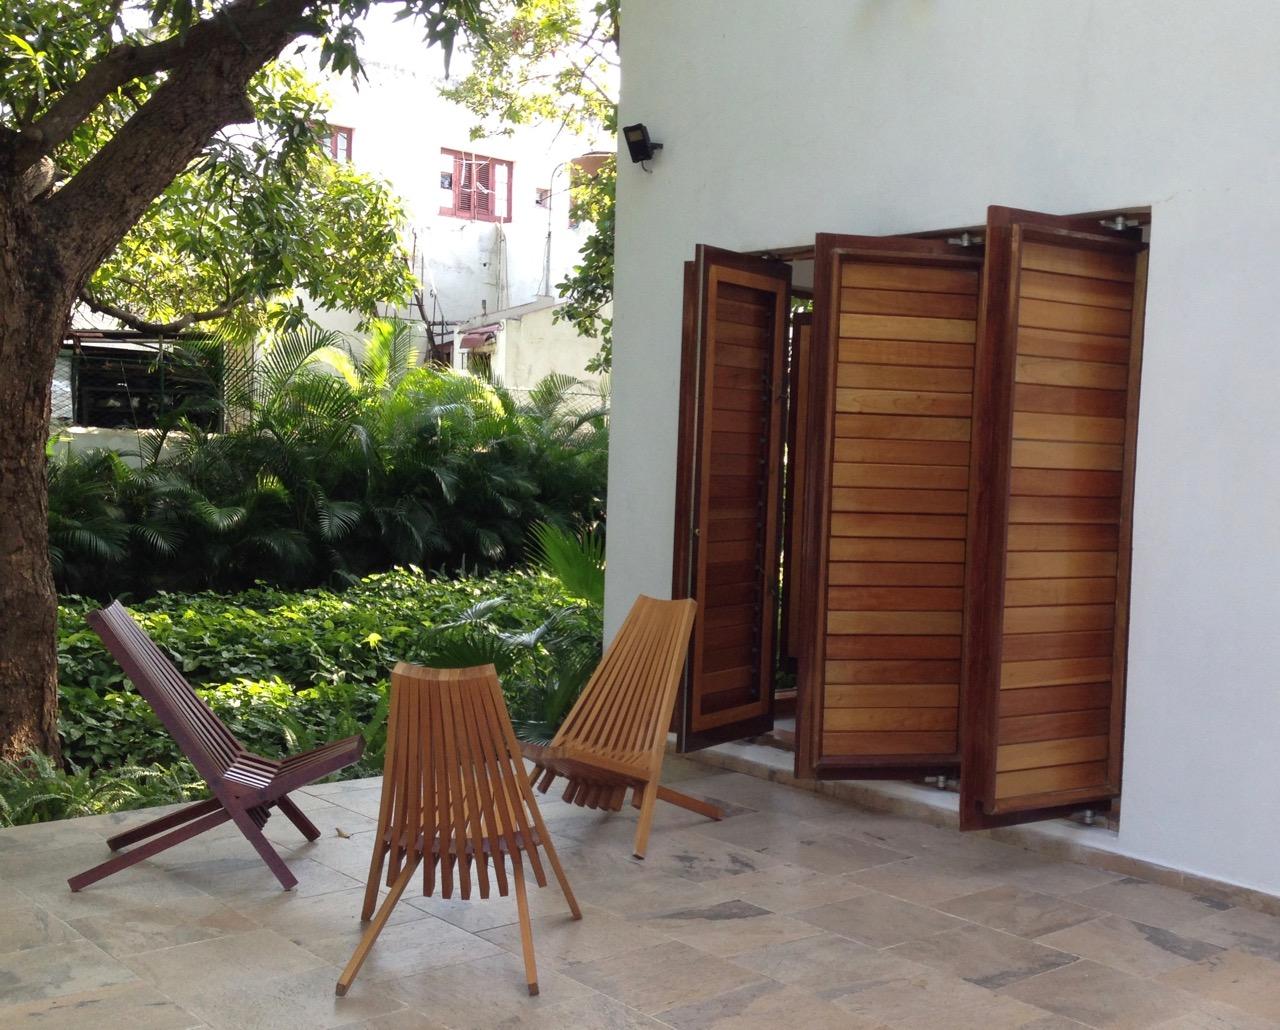 Cuba_Havana_Lab26Courtyard